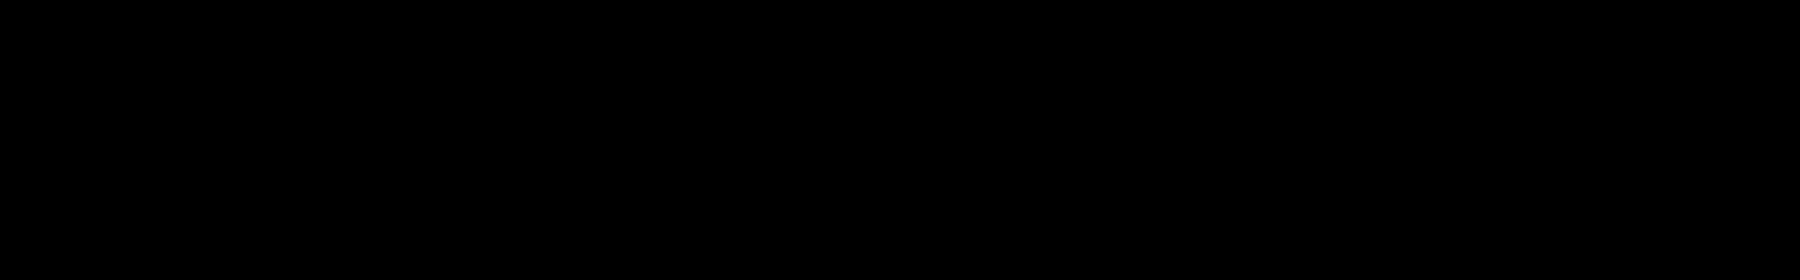 Layton Giordani Style Ableton Live Template audio waveform